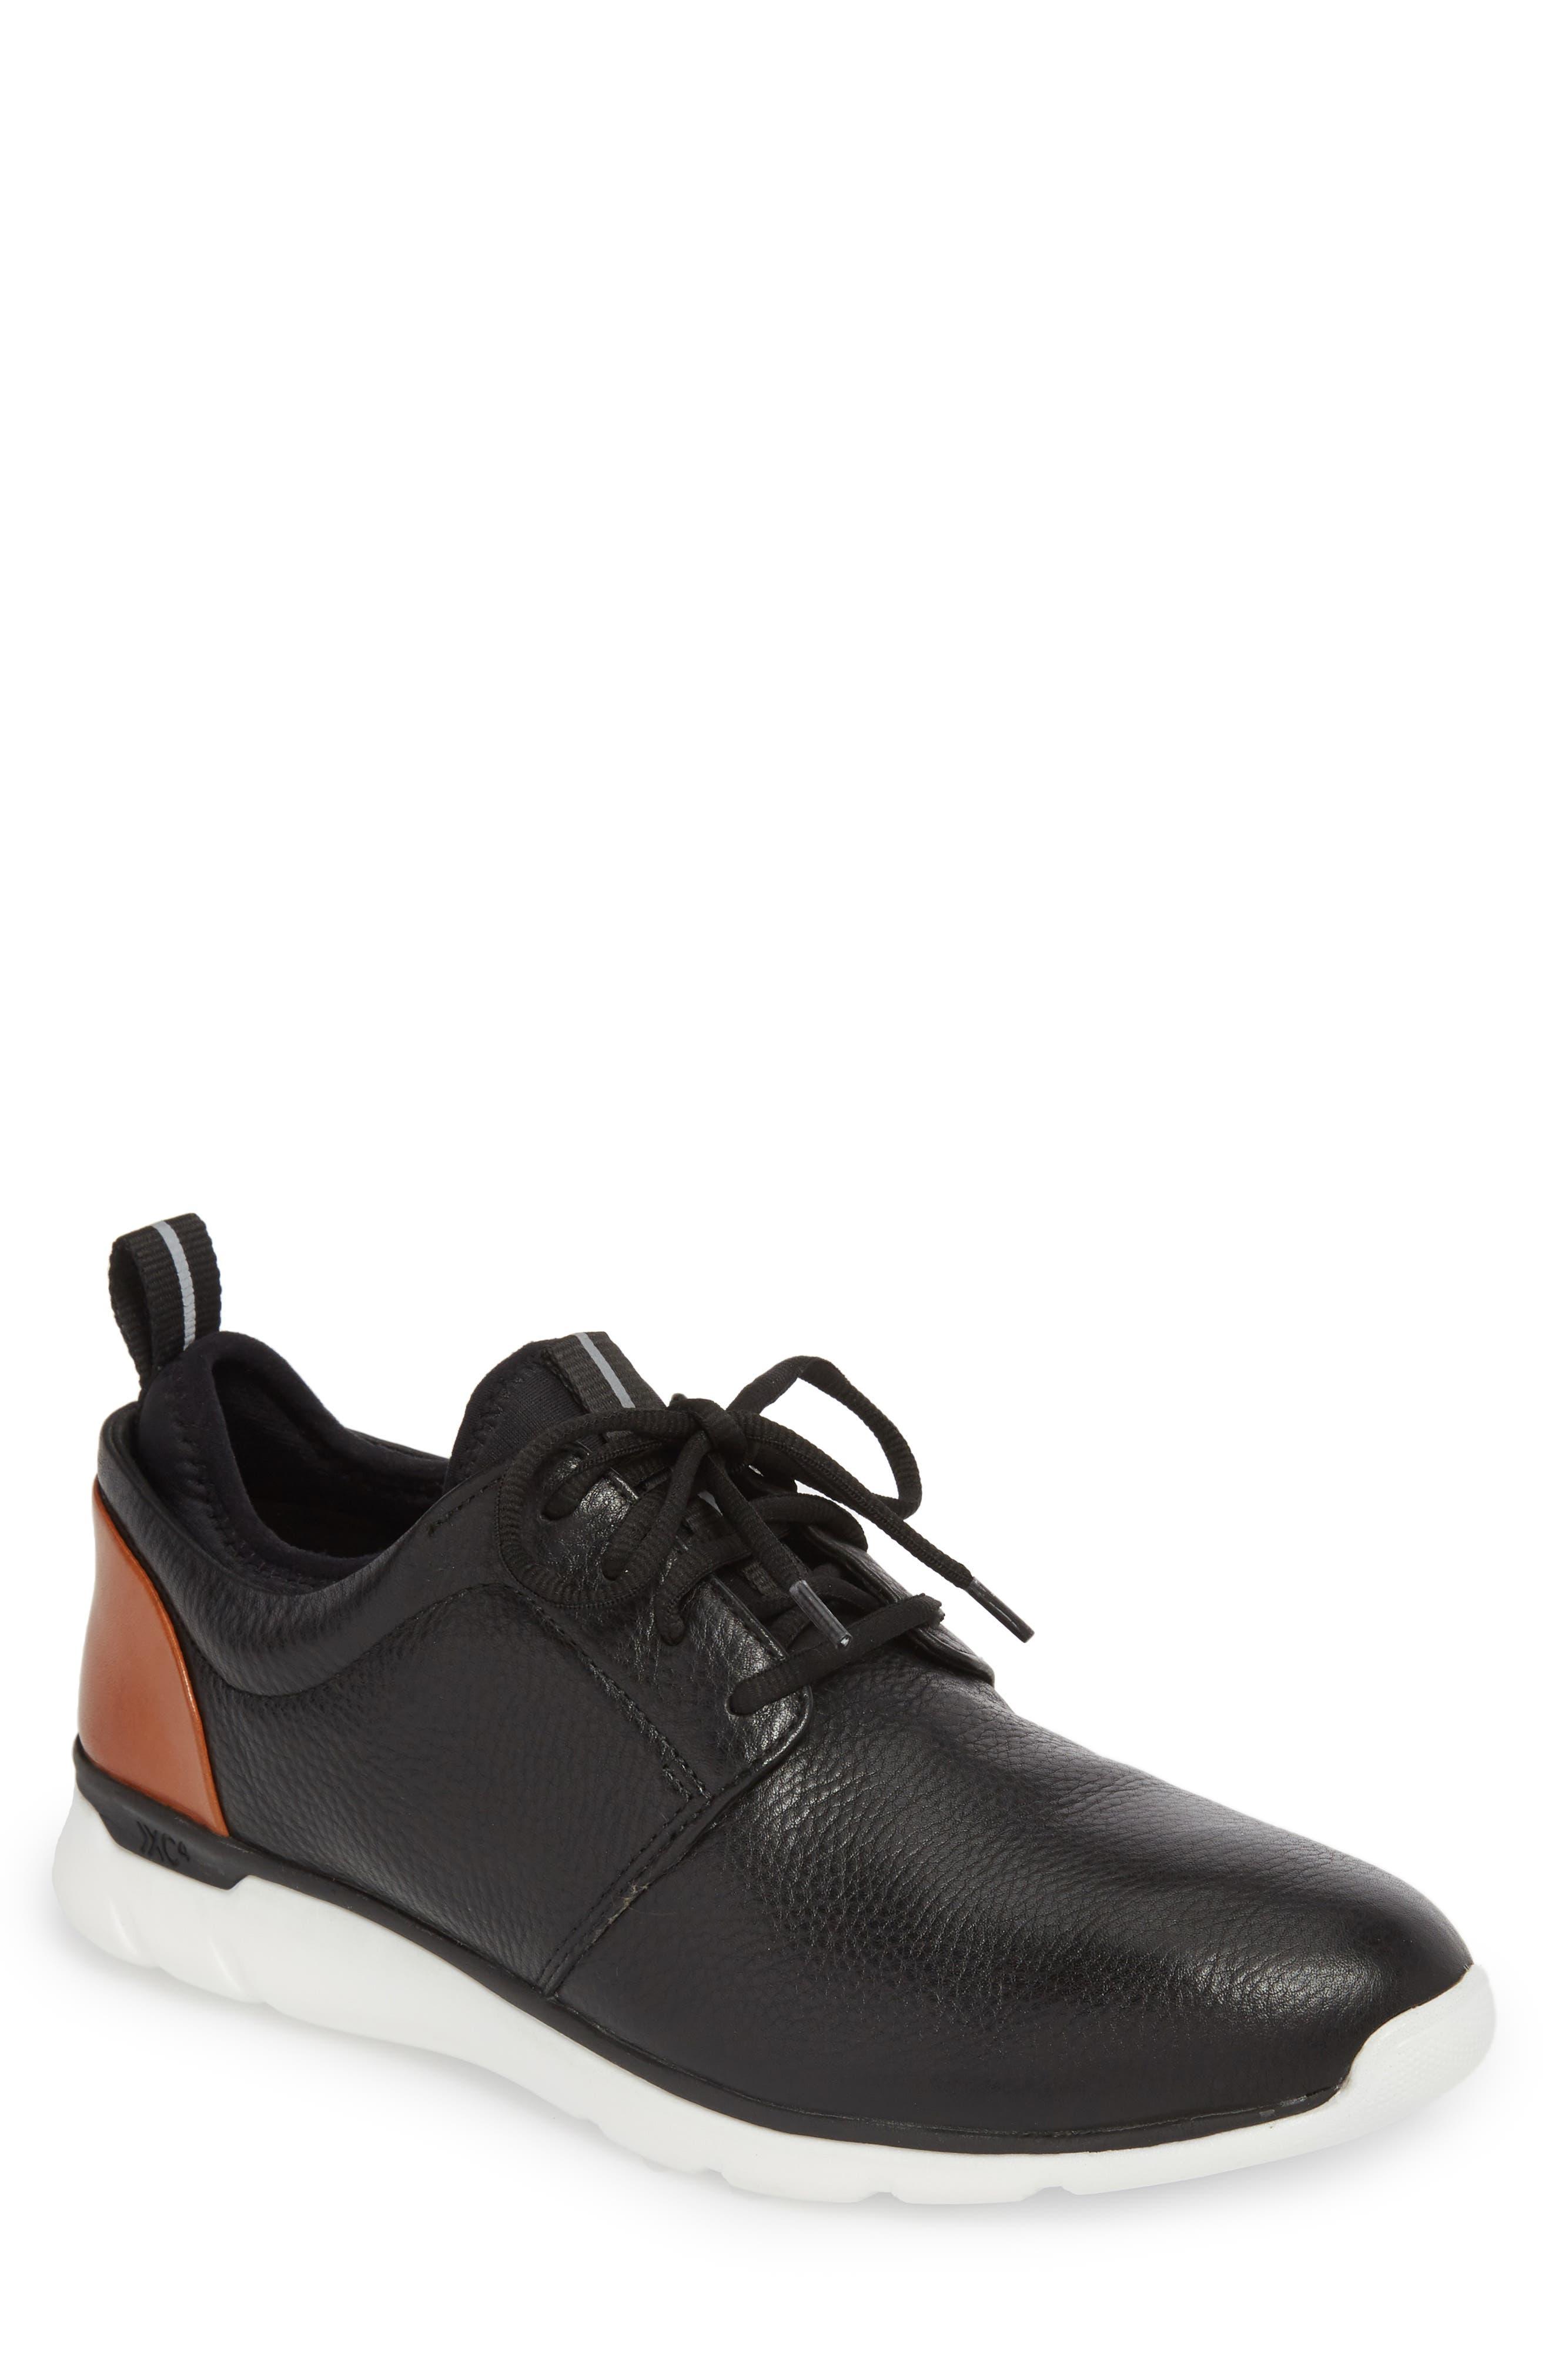 Alternate Image 1 Selected - Johnston & Murphy Prentiss XC4® Waterproof Low Top Sneaker (Men)